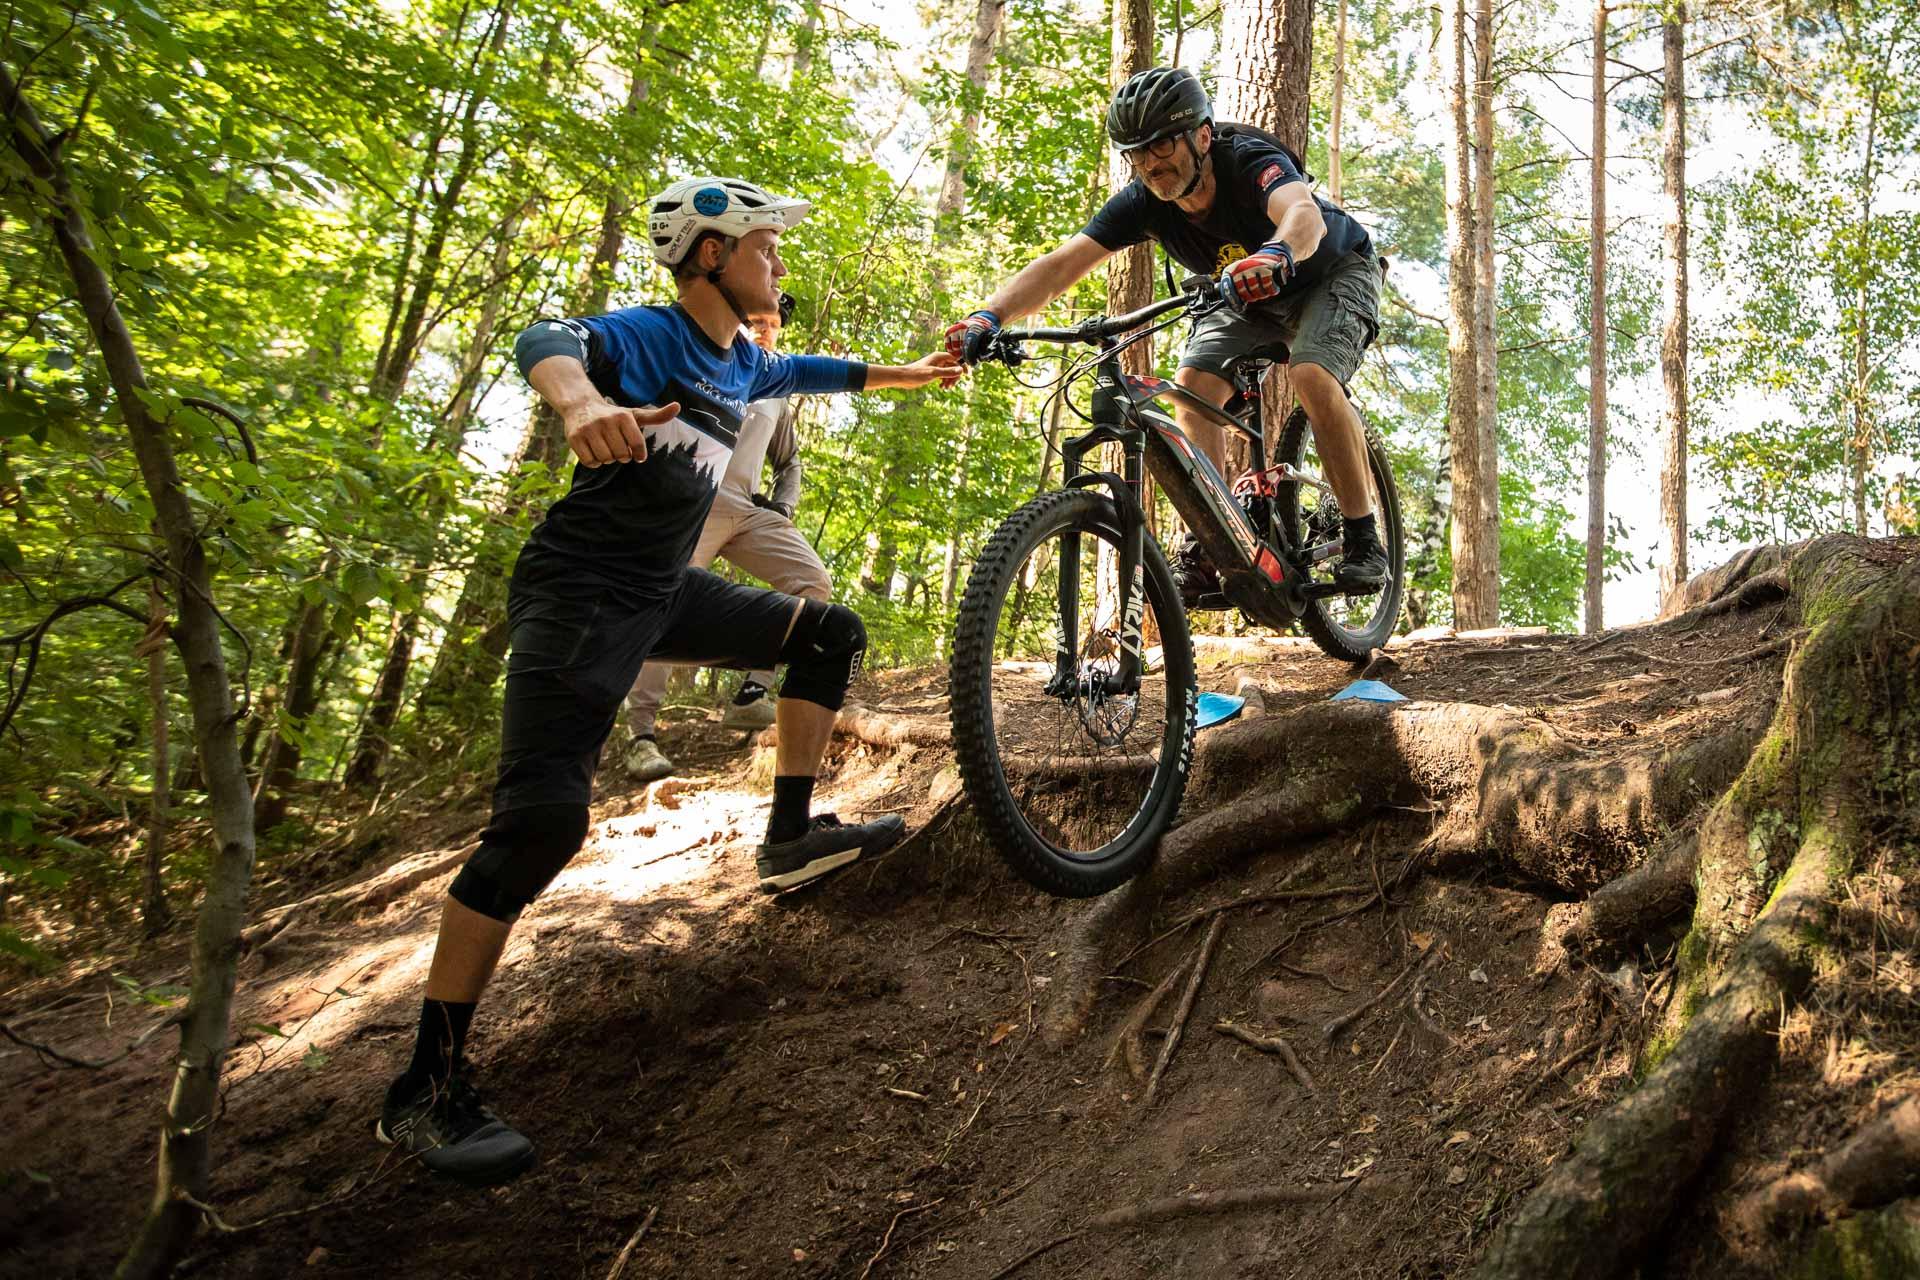 eMTB Fortgeschritten Fahrtechnik Kurs in Bad Salzdetfurth - Hannover Niedersachsachen - Mountainbike Fortgeschritten - Rock my Trail Bikeschule